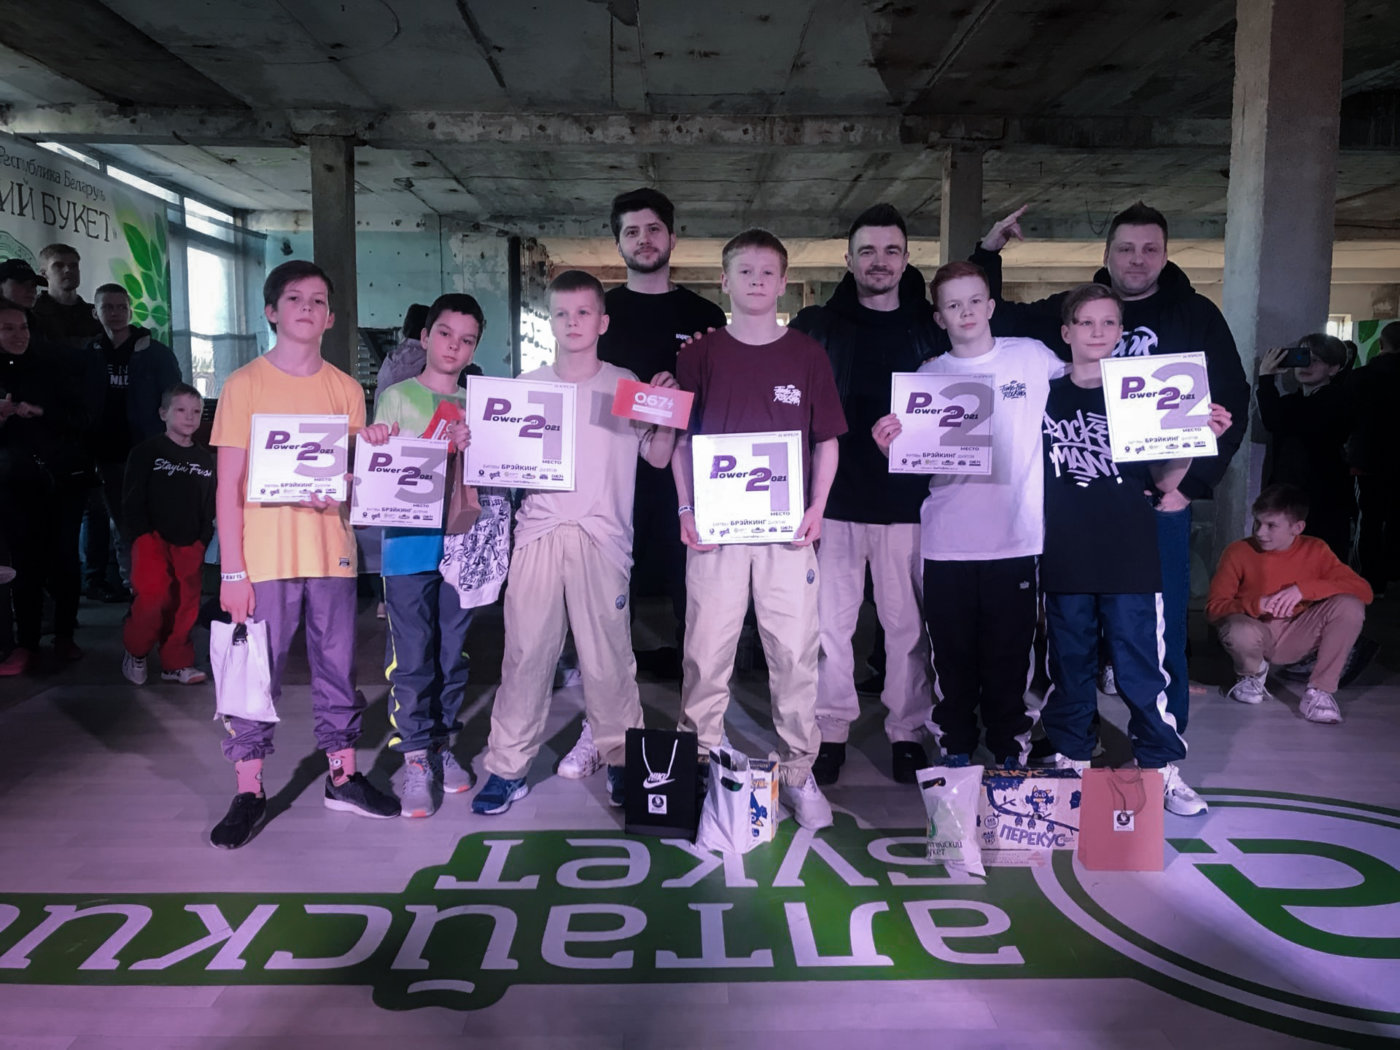 Победа наших учеников на брейк-данс фестивале Power of 2